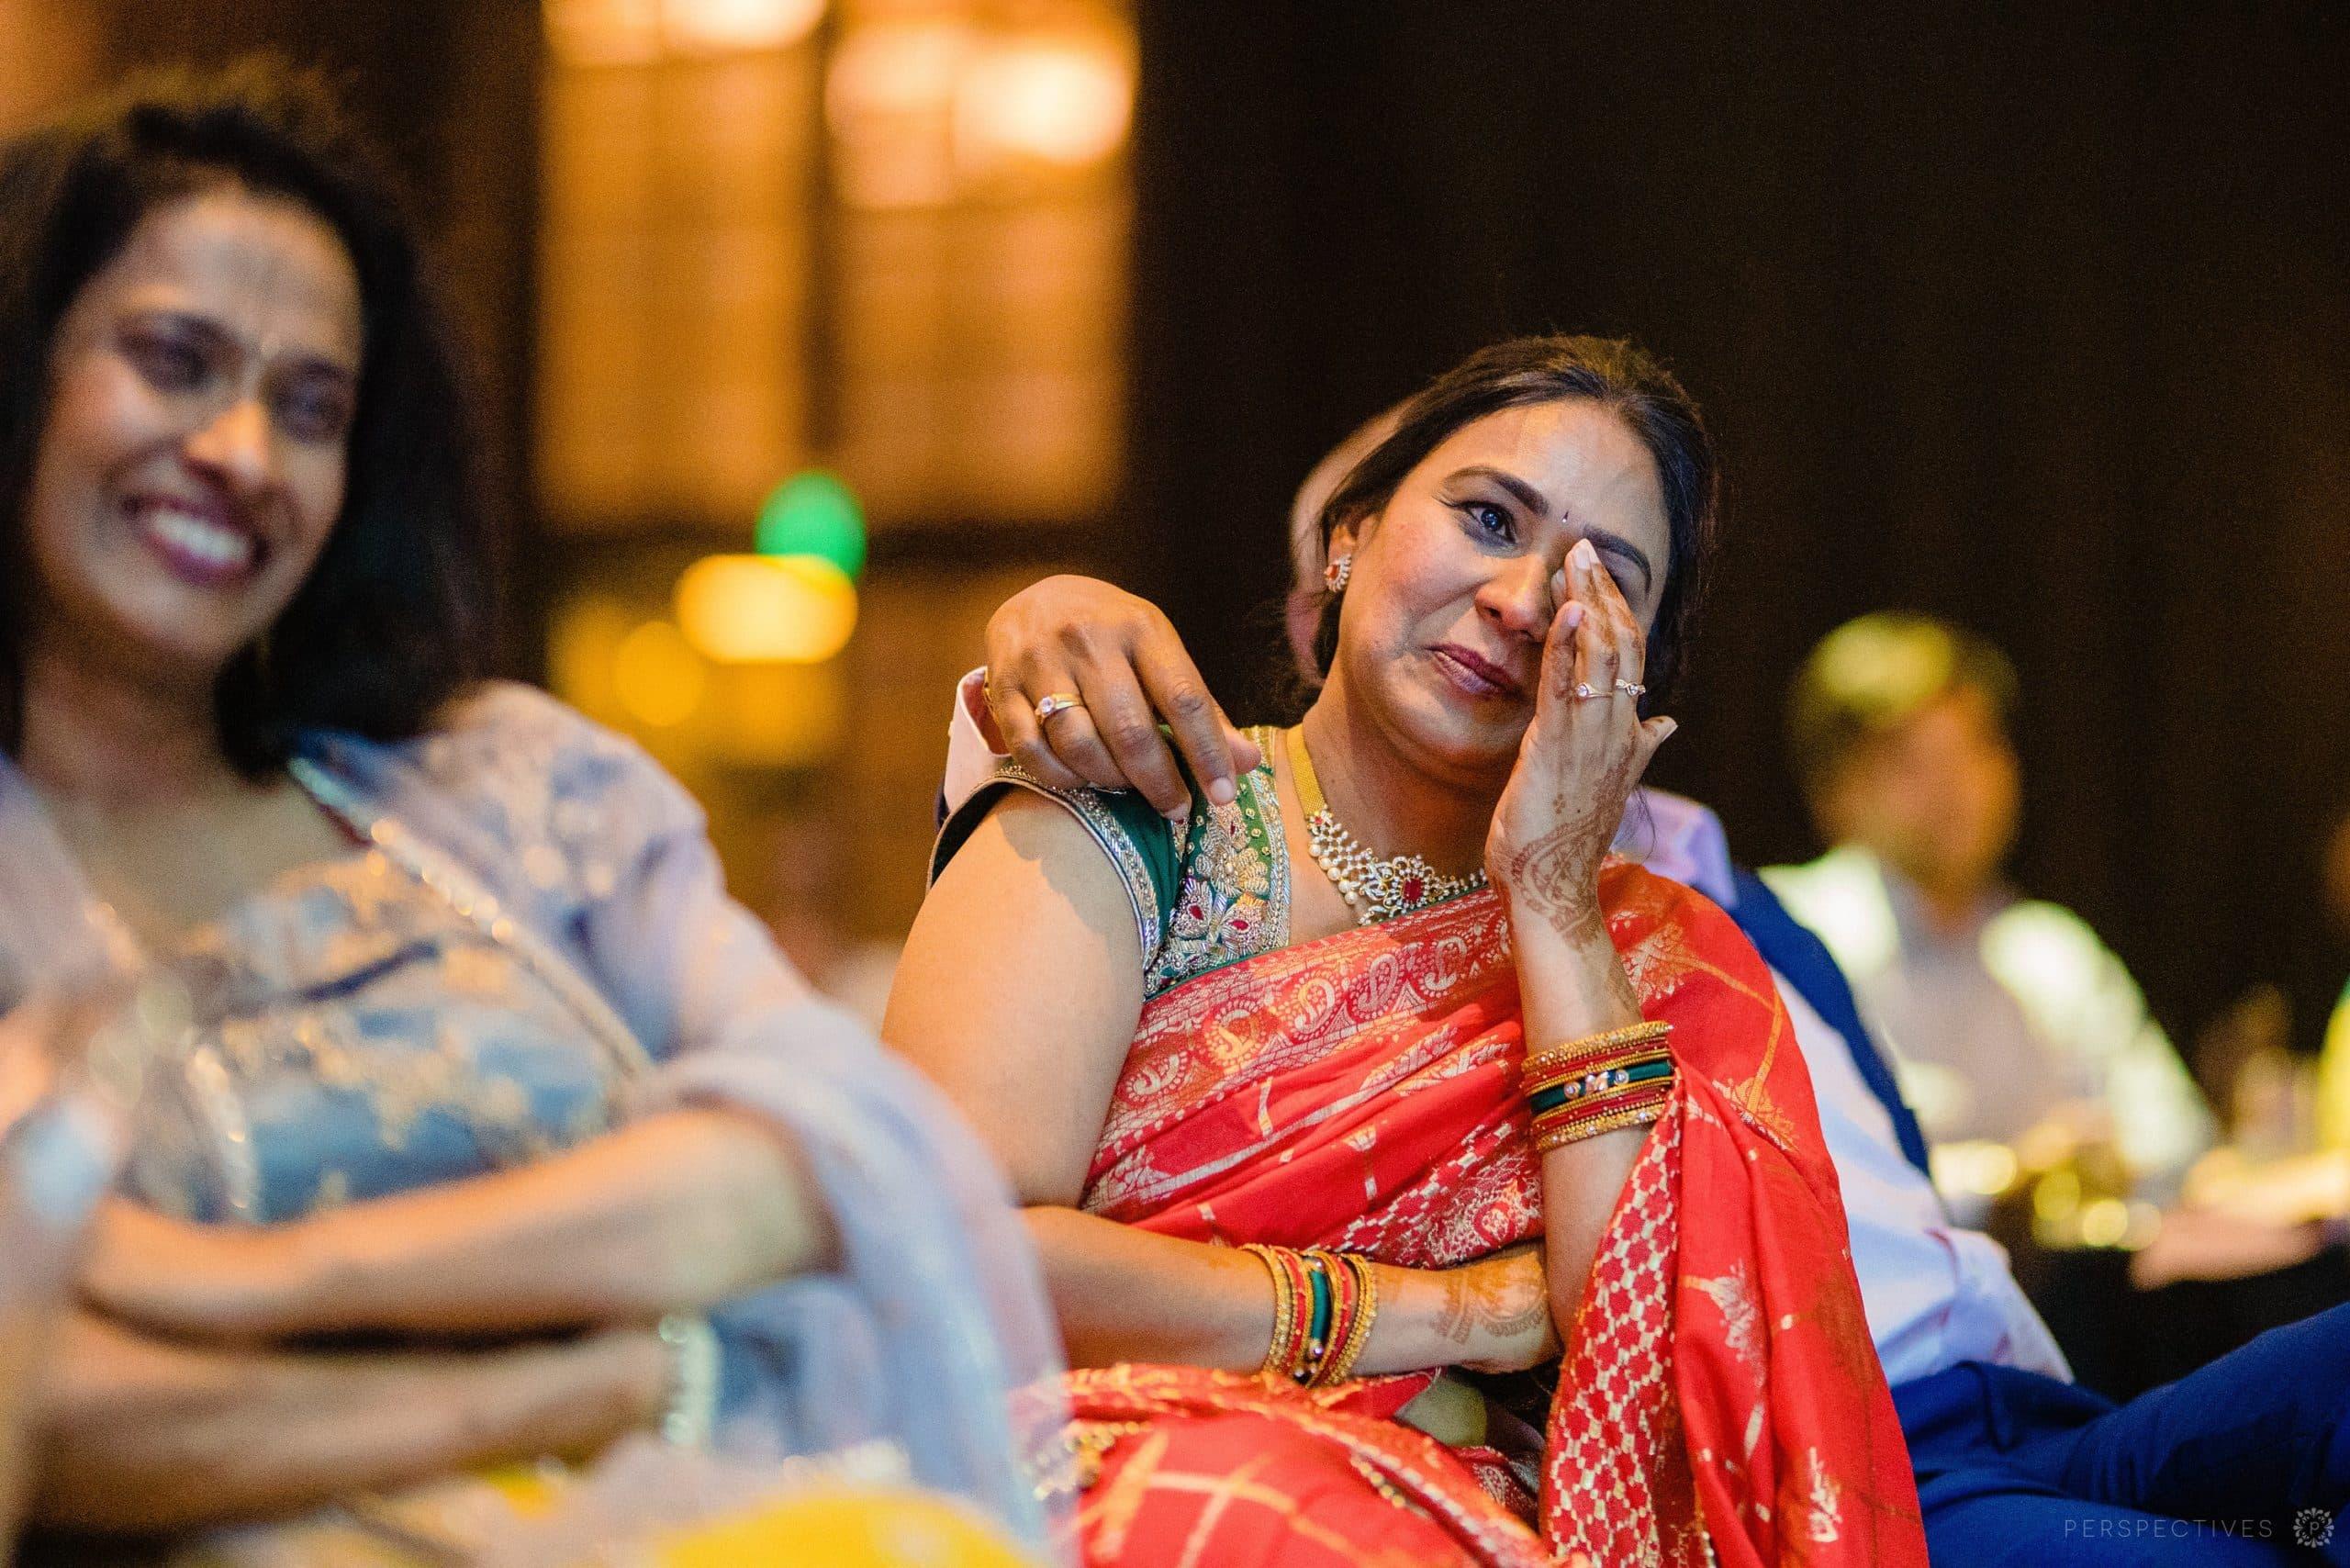 Indian wedding reception Cordis photography